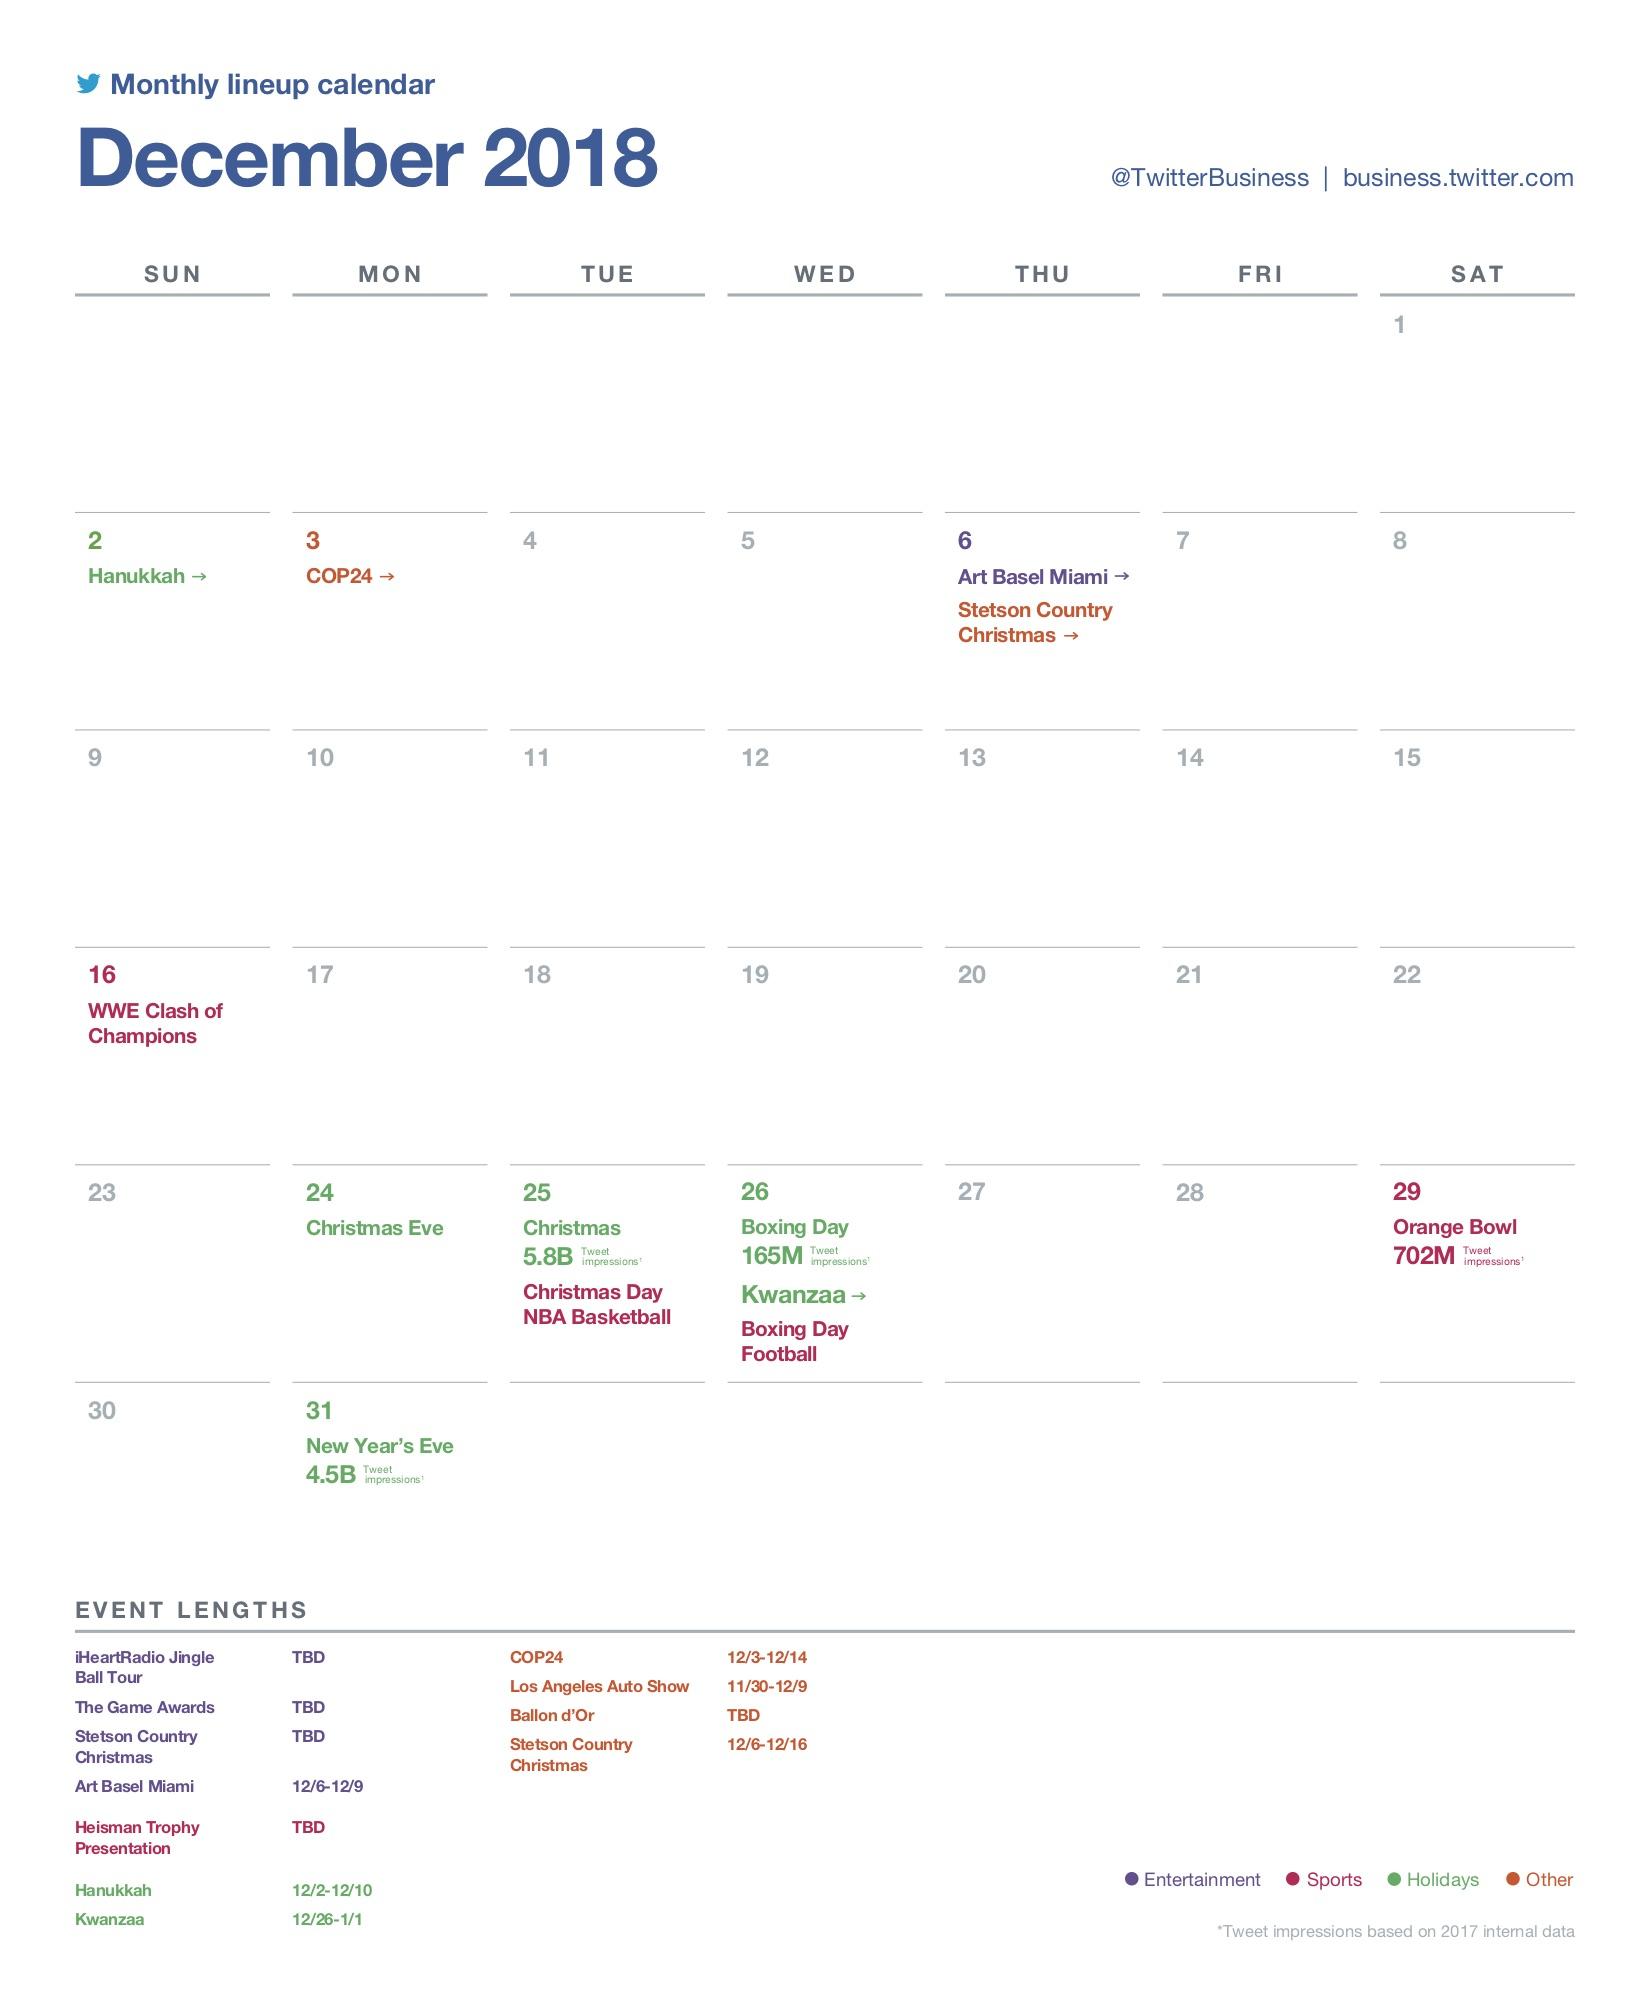 Twitter major events listing - December 2018